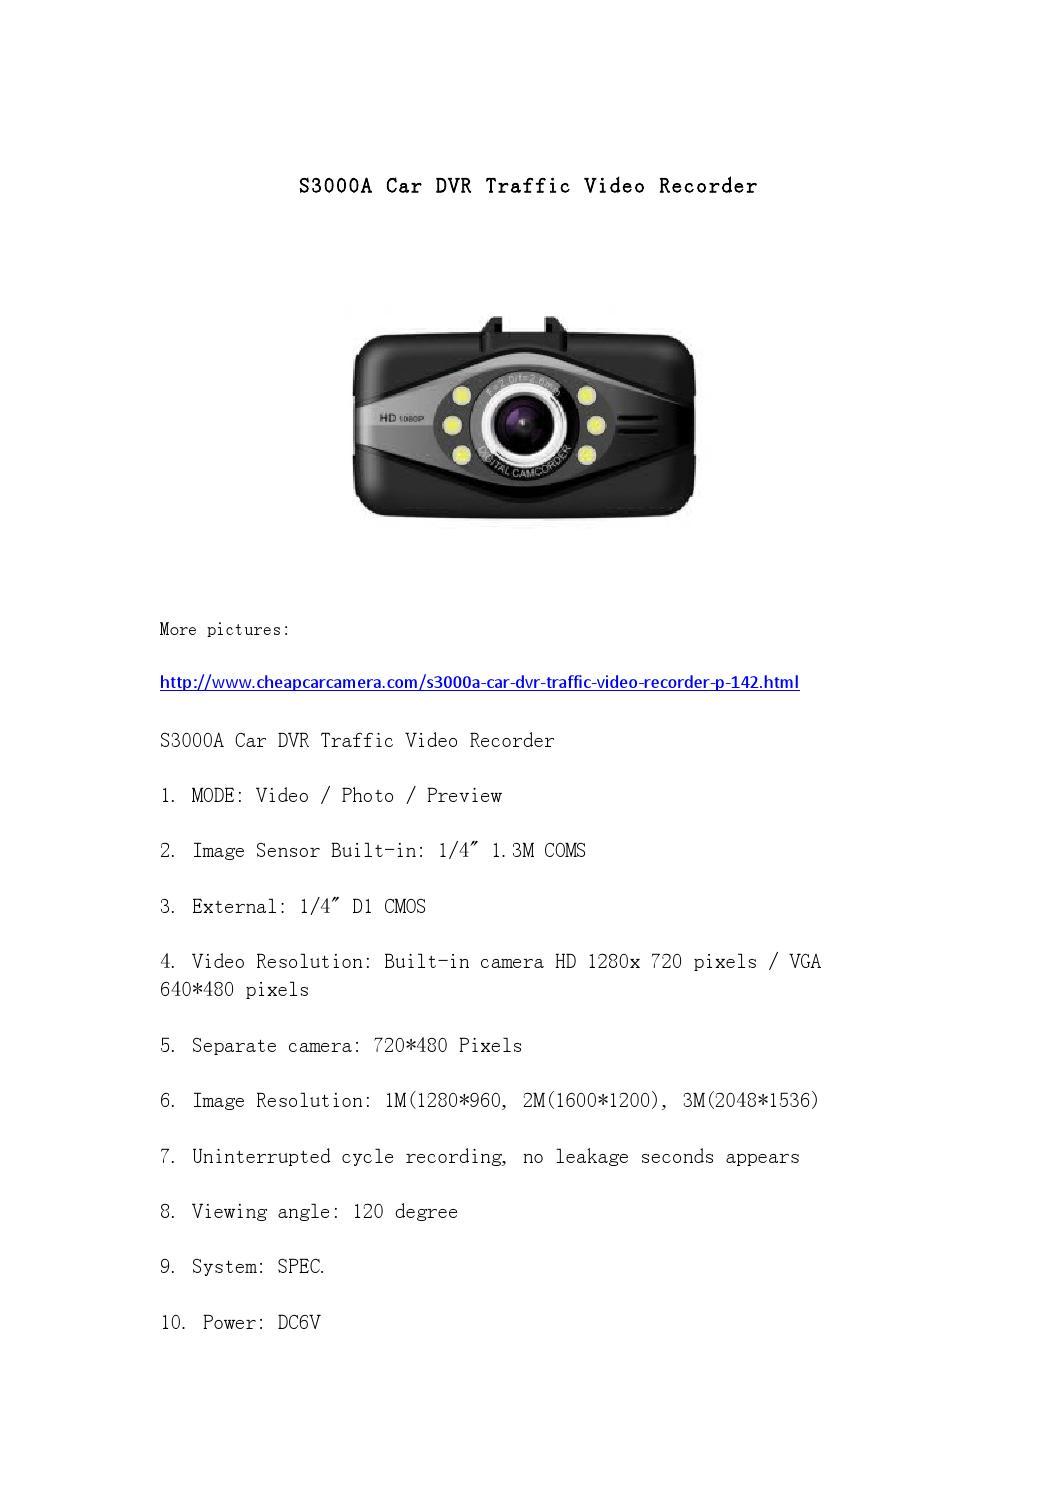 s3000a car dvr traffic video recorder by cardvr carcamera